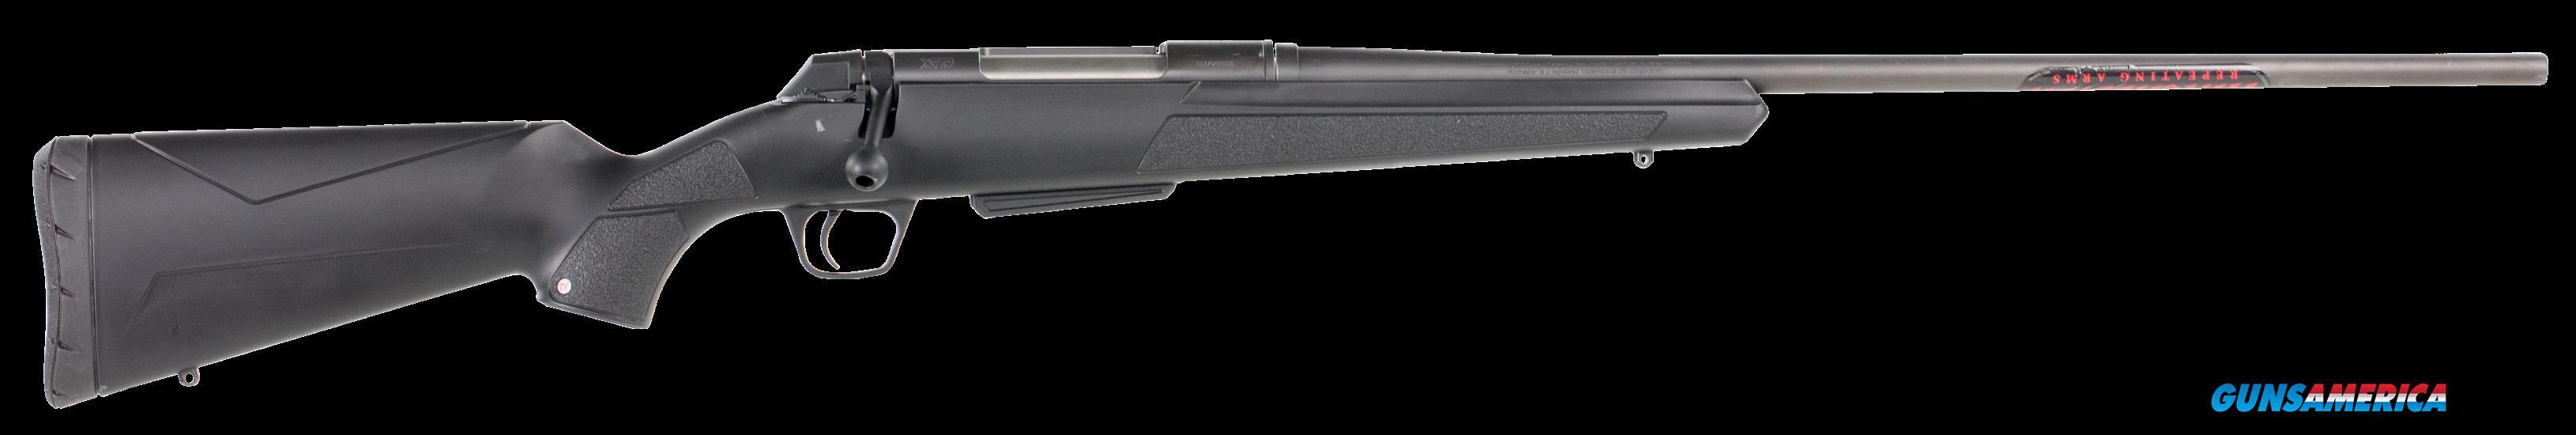 Winchester Guns Xpr, Wgun 535700228 Xpr 3006  Guns > Pistols > 1911 Pistol Copies (non-Colt)